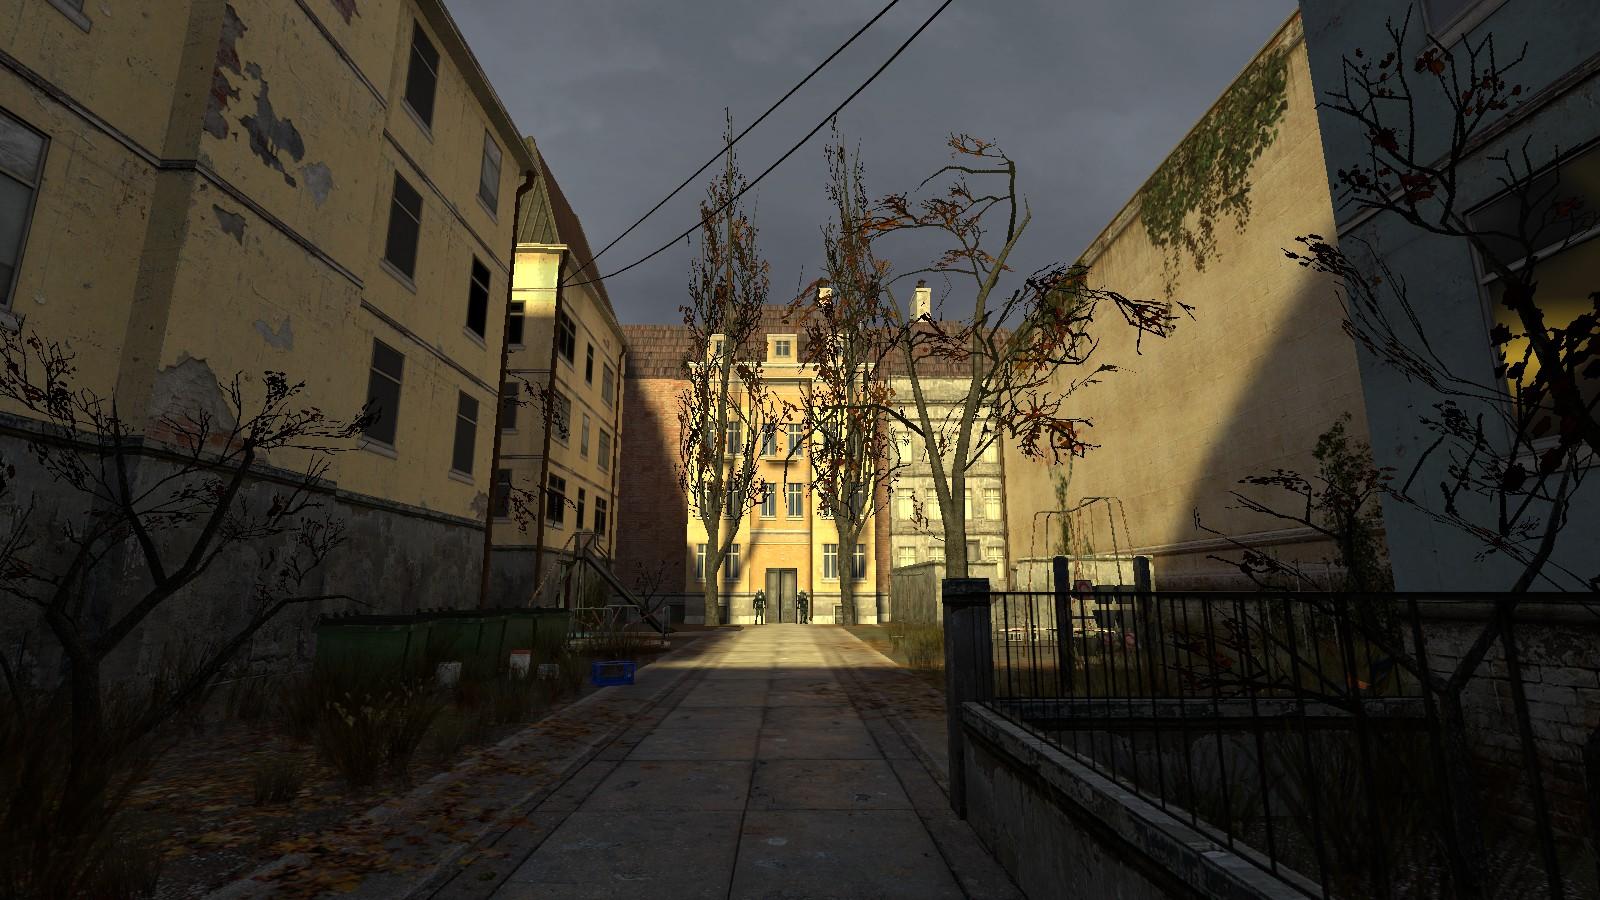 city 17 apt entry